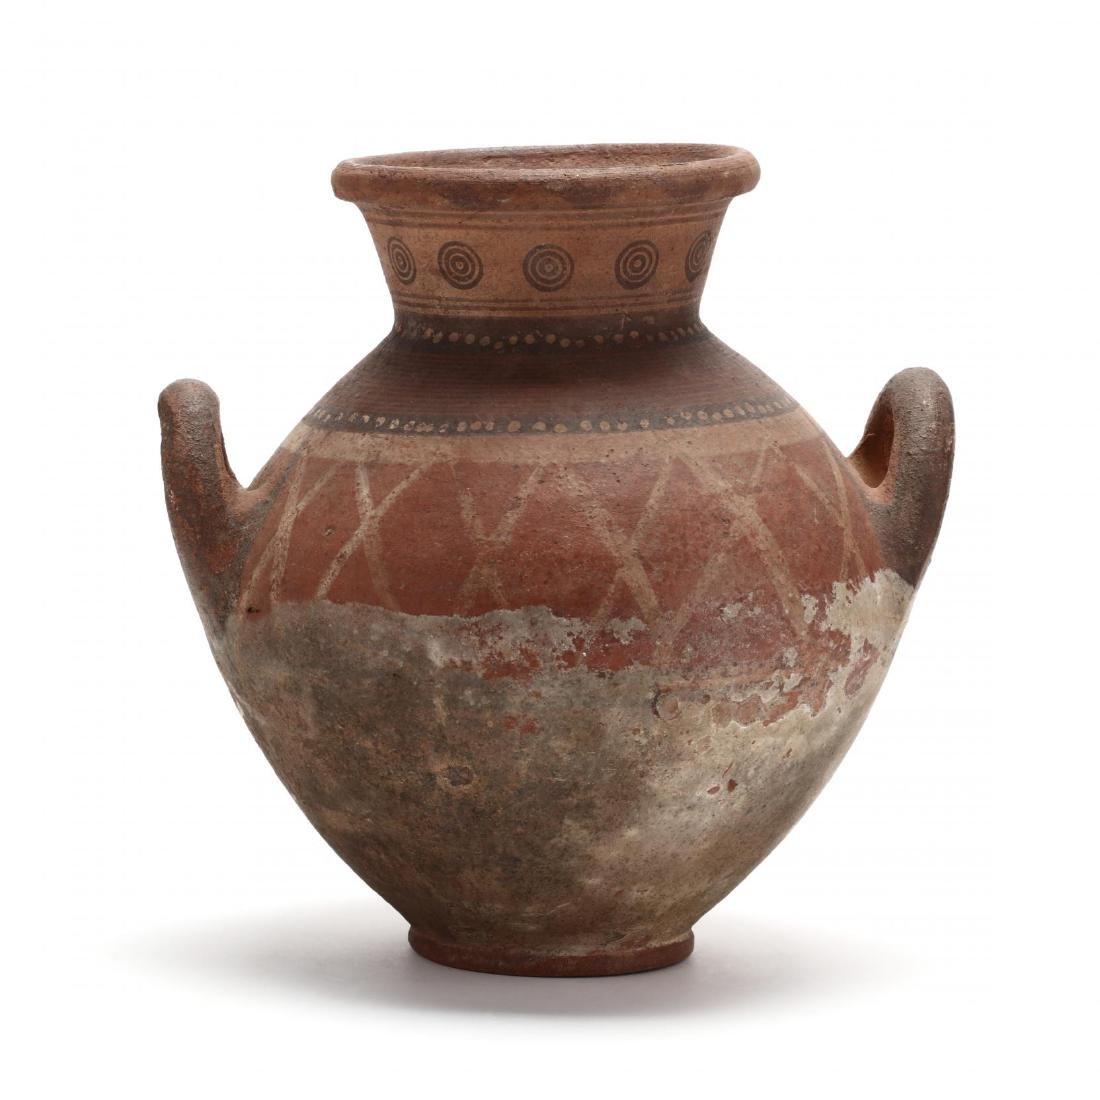 Large Cypro-Geometric Jar, Ex. Cesnola Collection